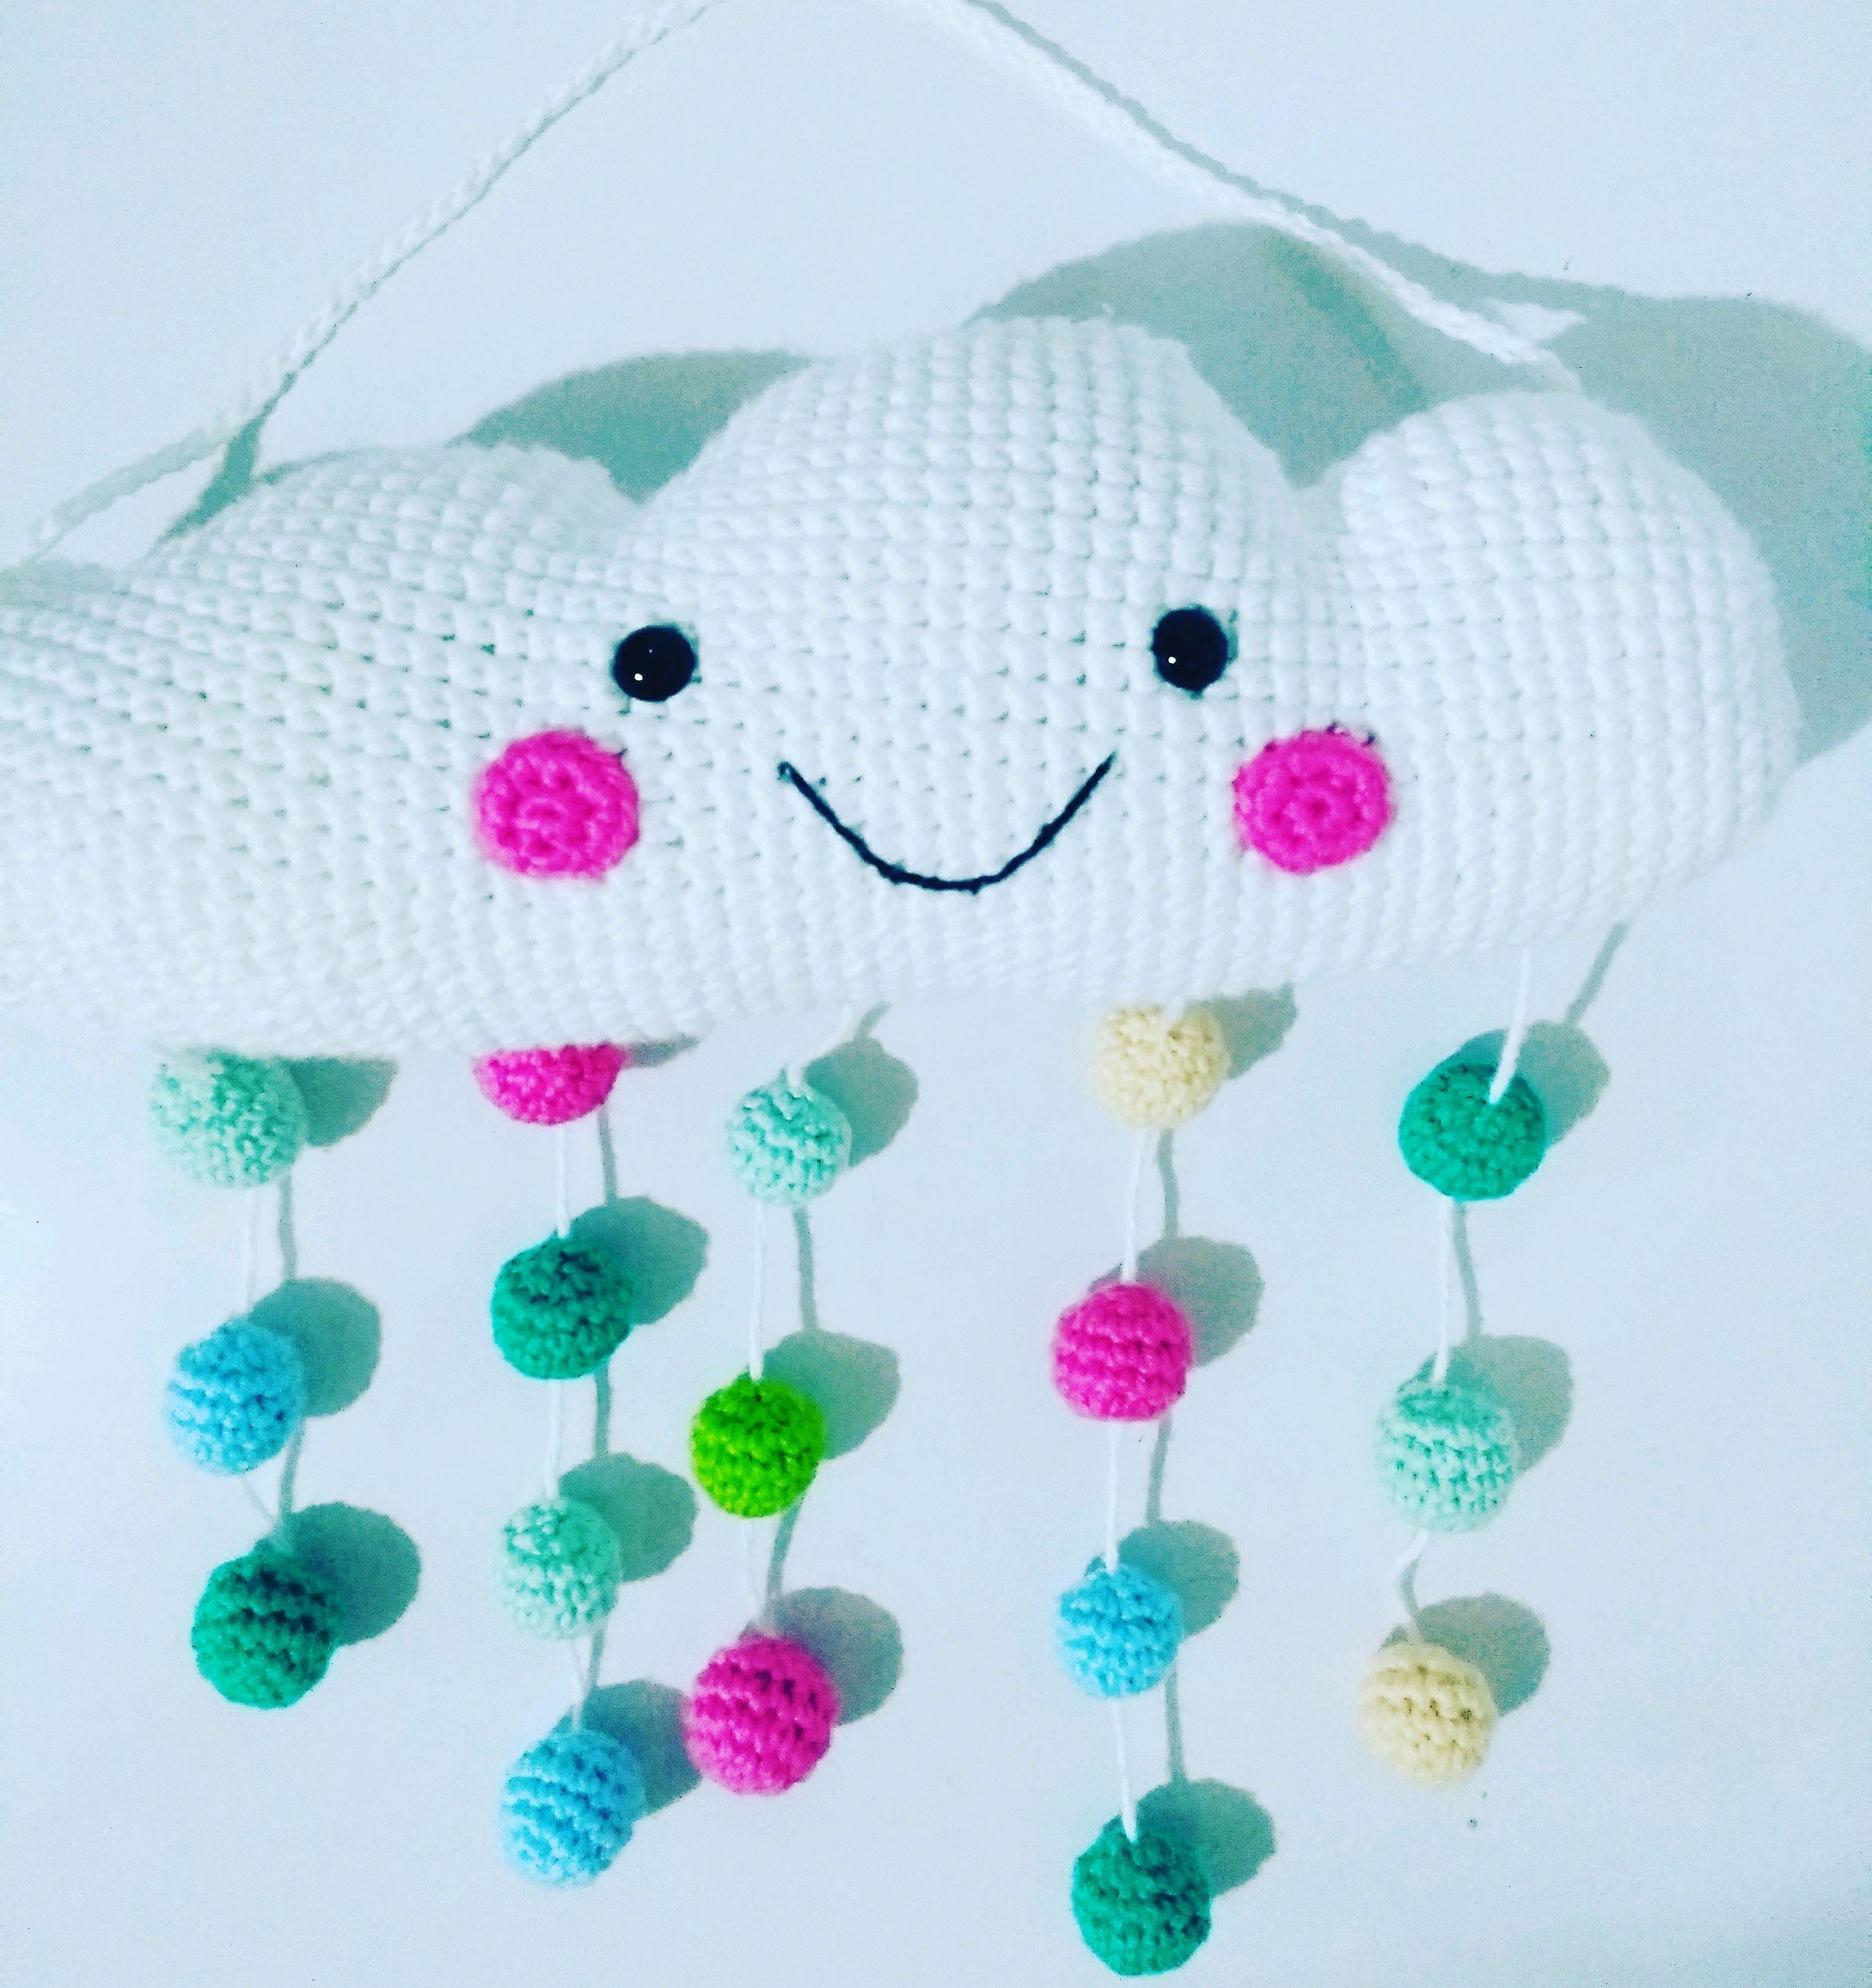 Nuvem amigurumi ☁️   Art da Tha   #amigurumi #mininuvem #croche ...   2600x2448